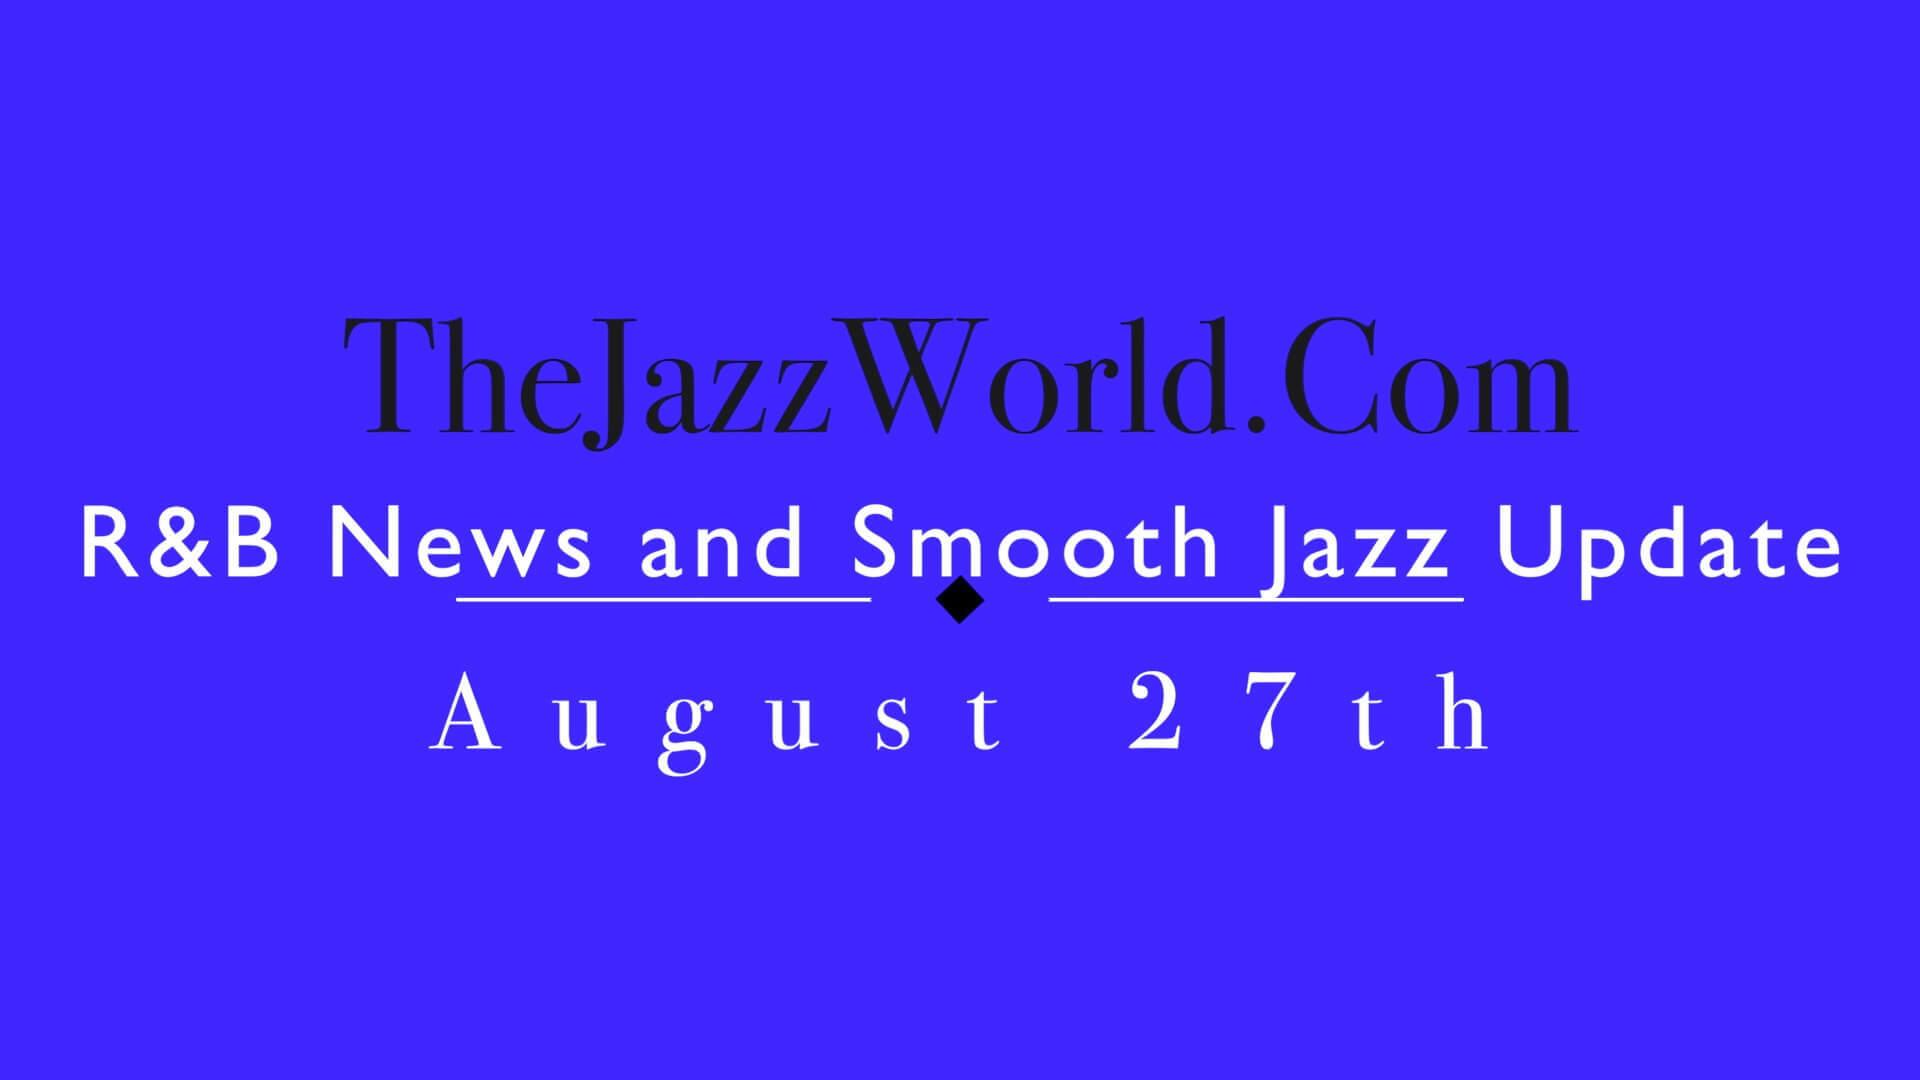 The Jazz World Show 8:27